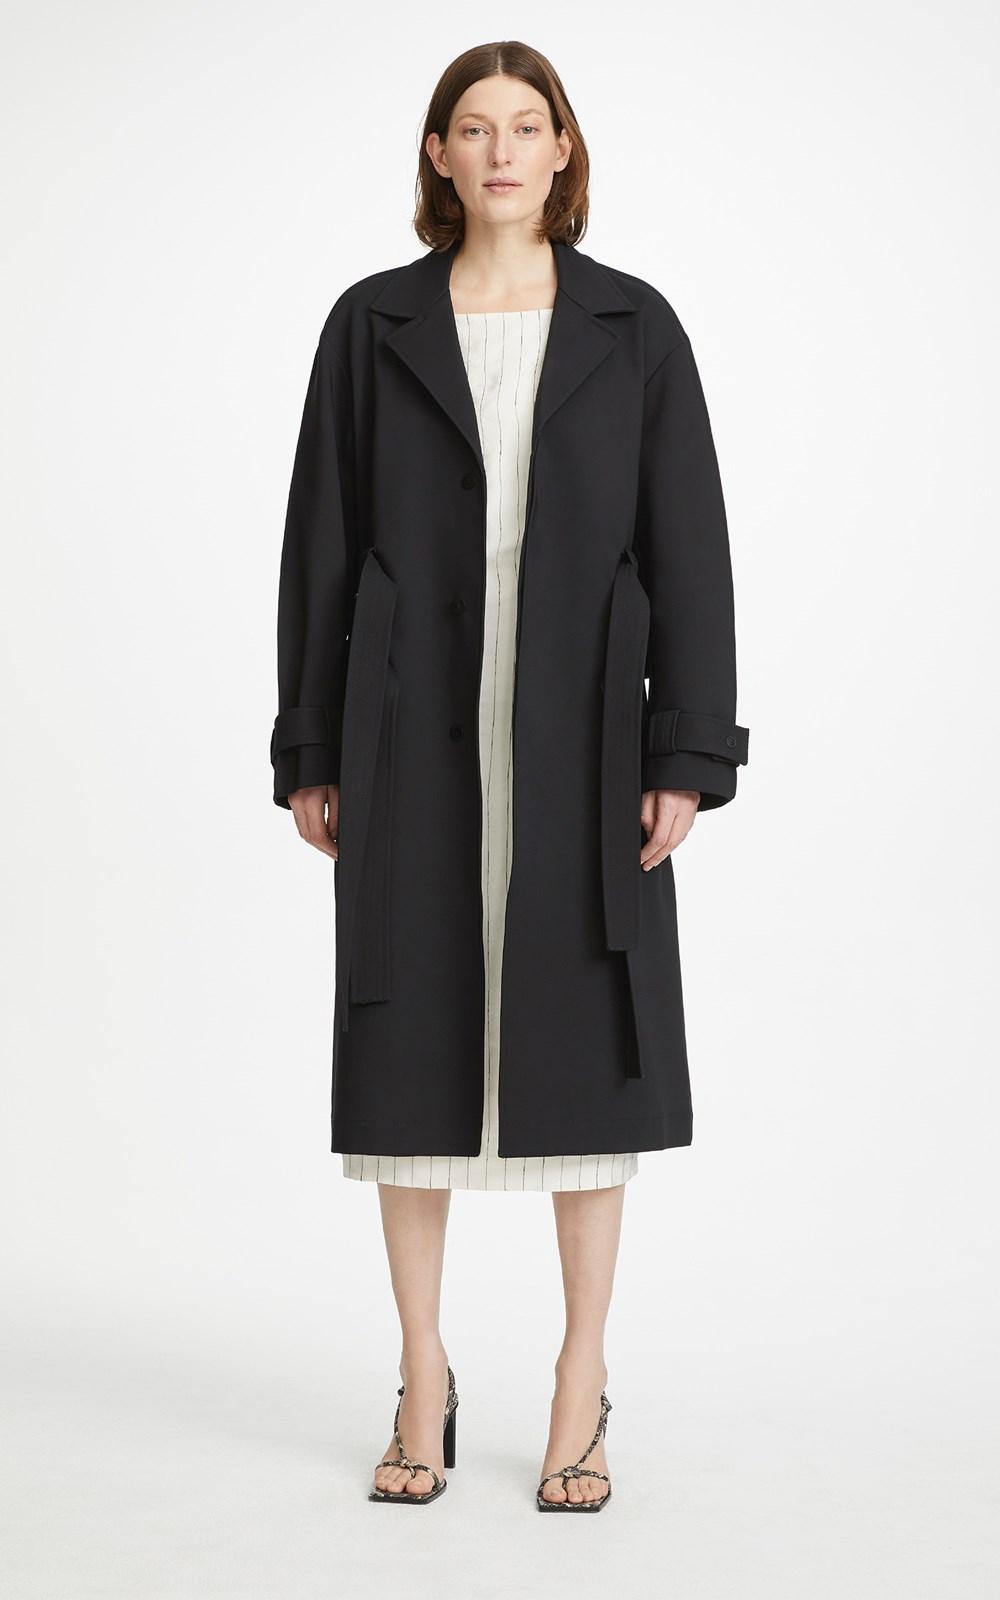 Outerwear | INTERCHANGE TRENCH